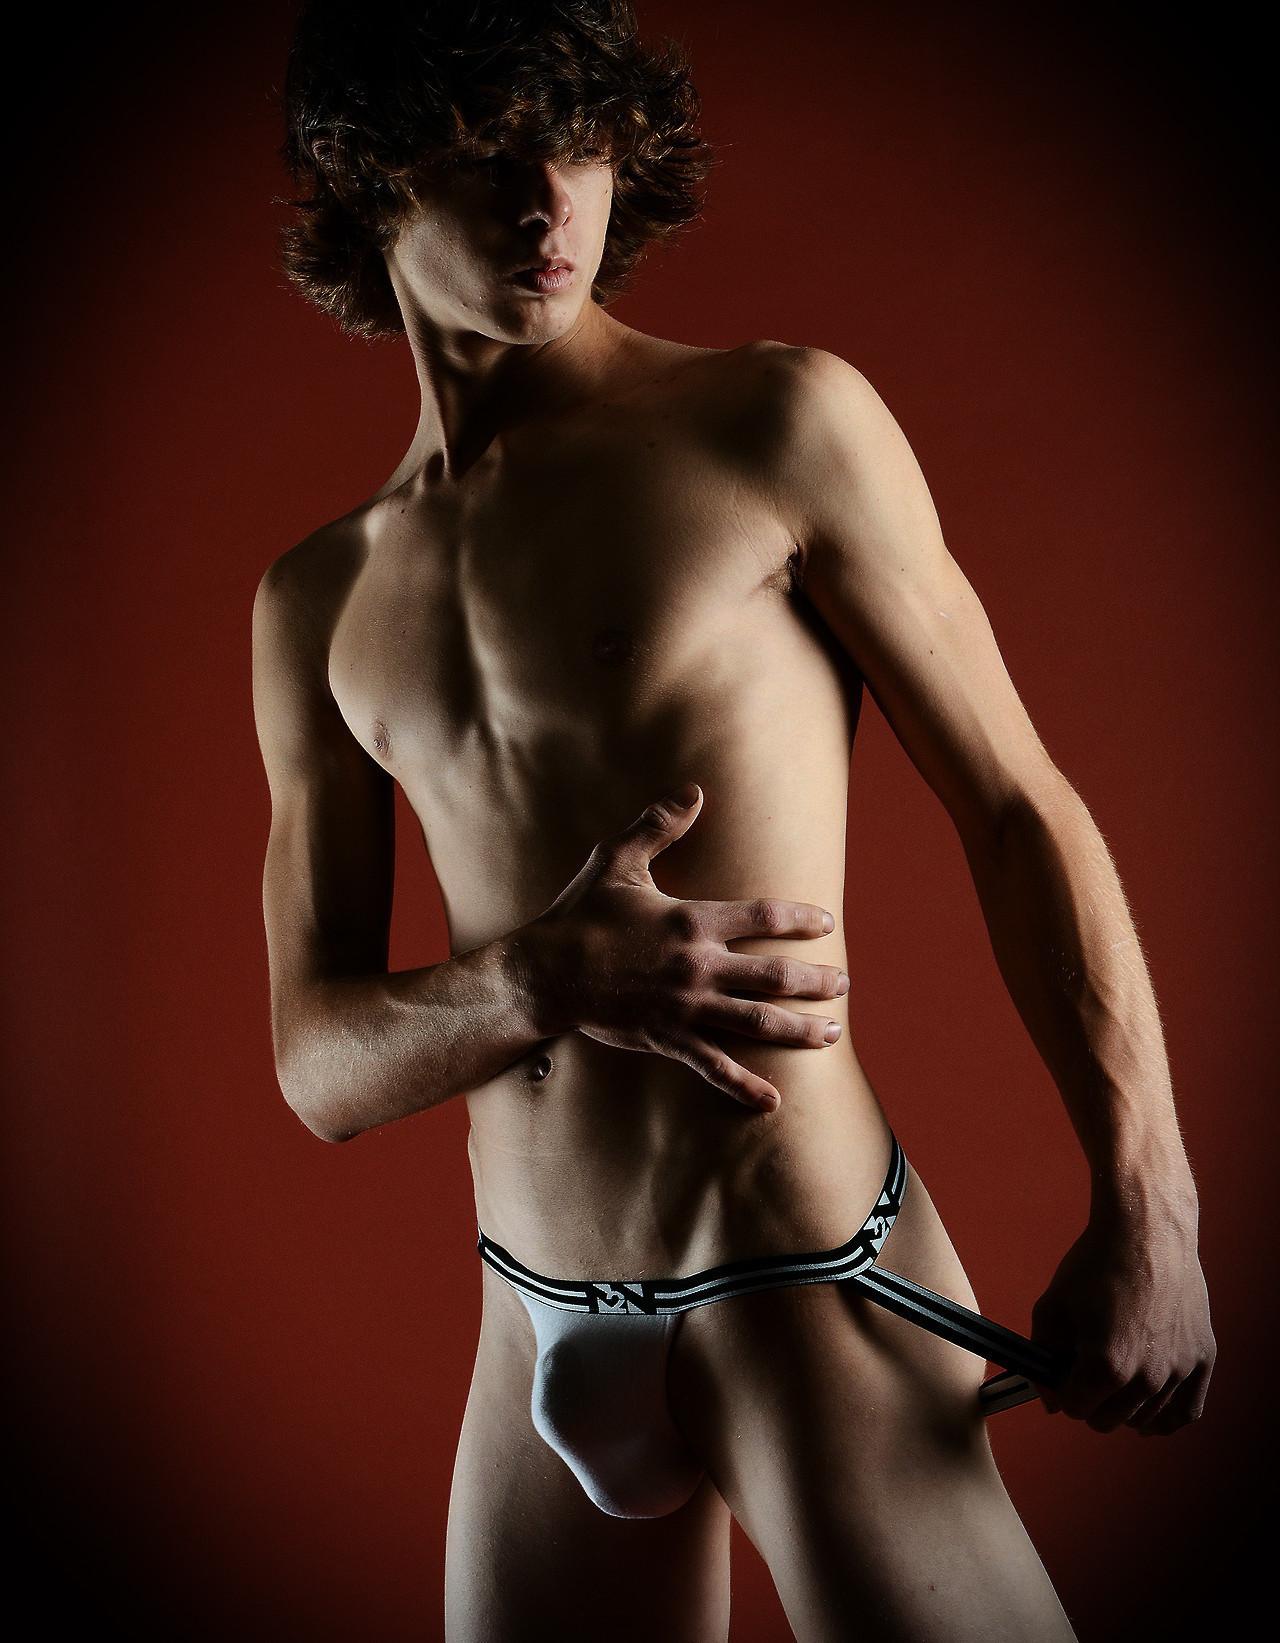 Sexy gay men underwear male lingerie jockstrap g string thongs mens un gaypridehub